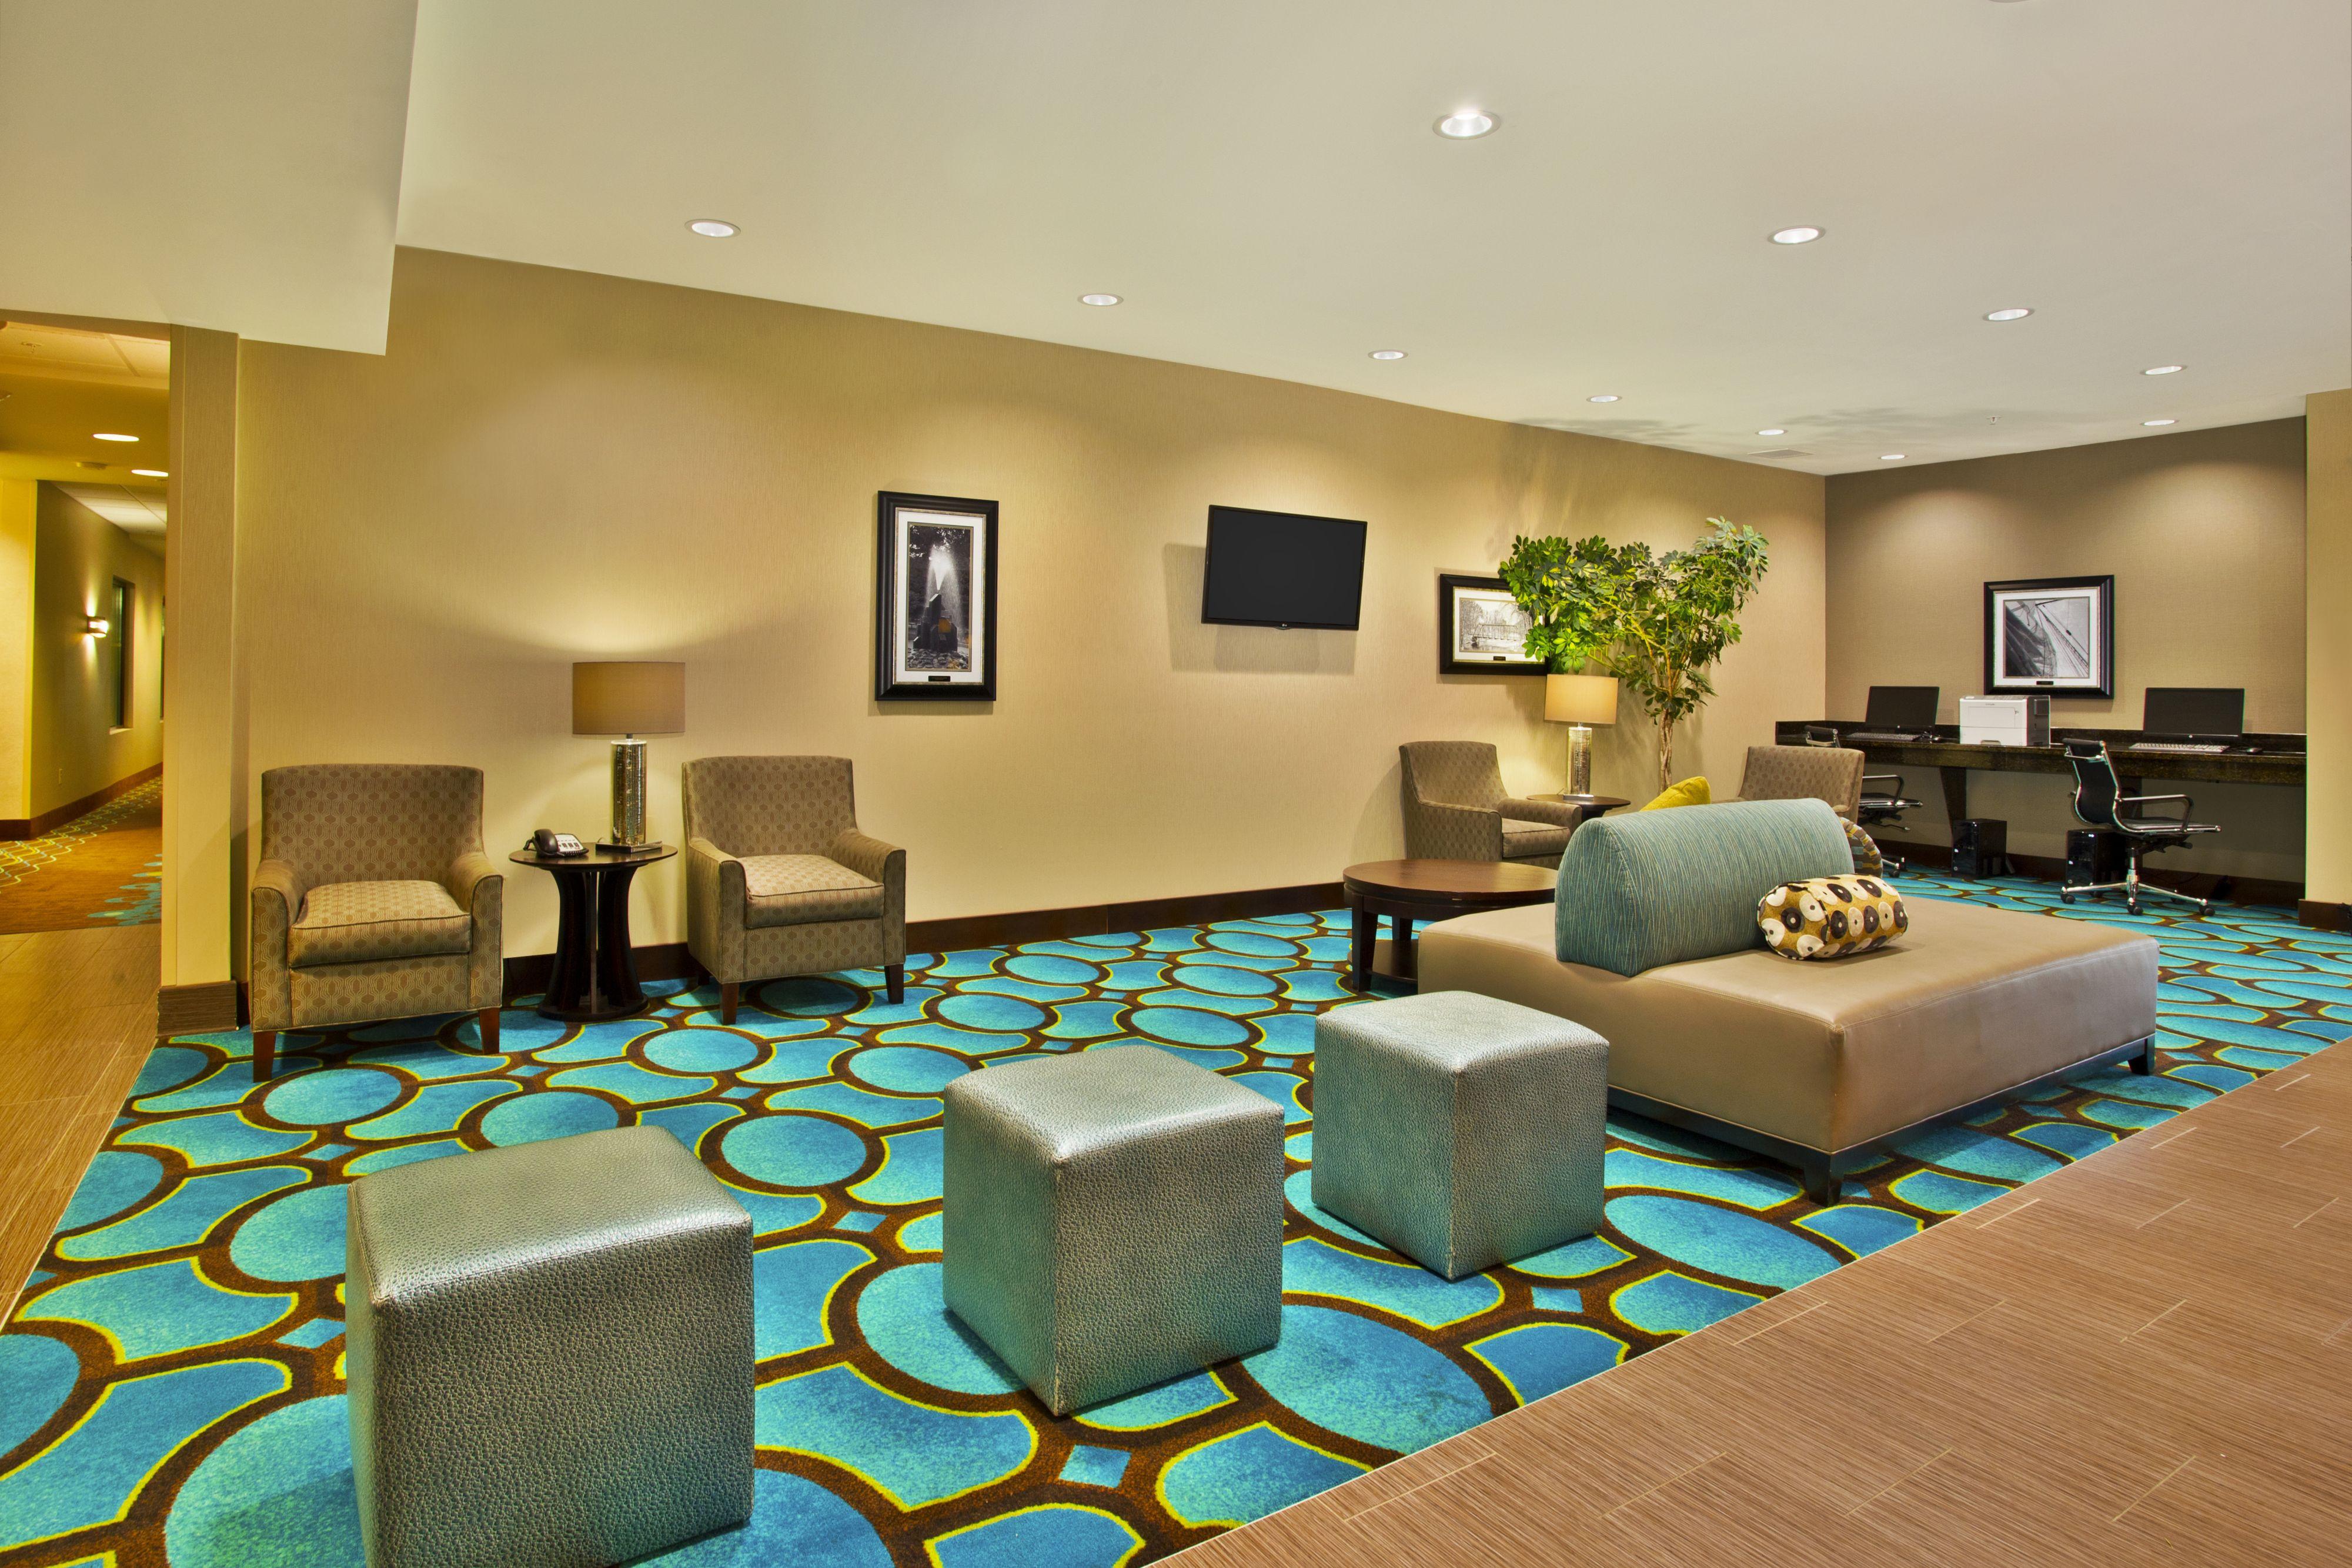 Holiday Inn Express Hastings image 6